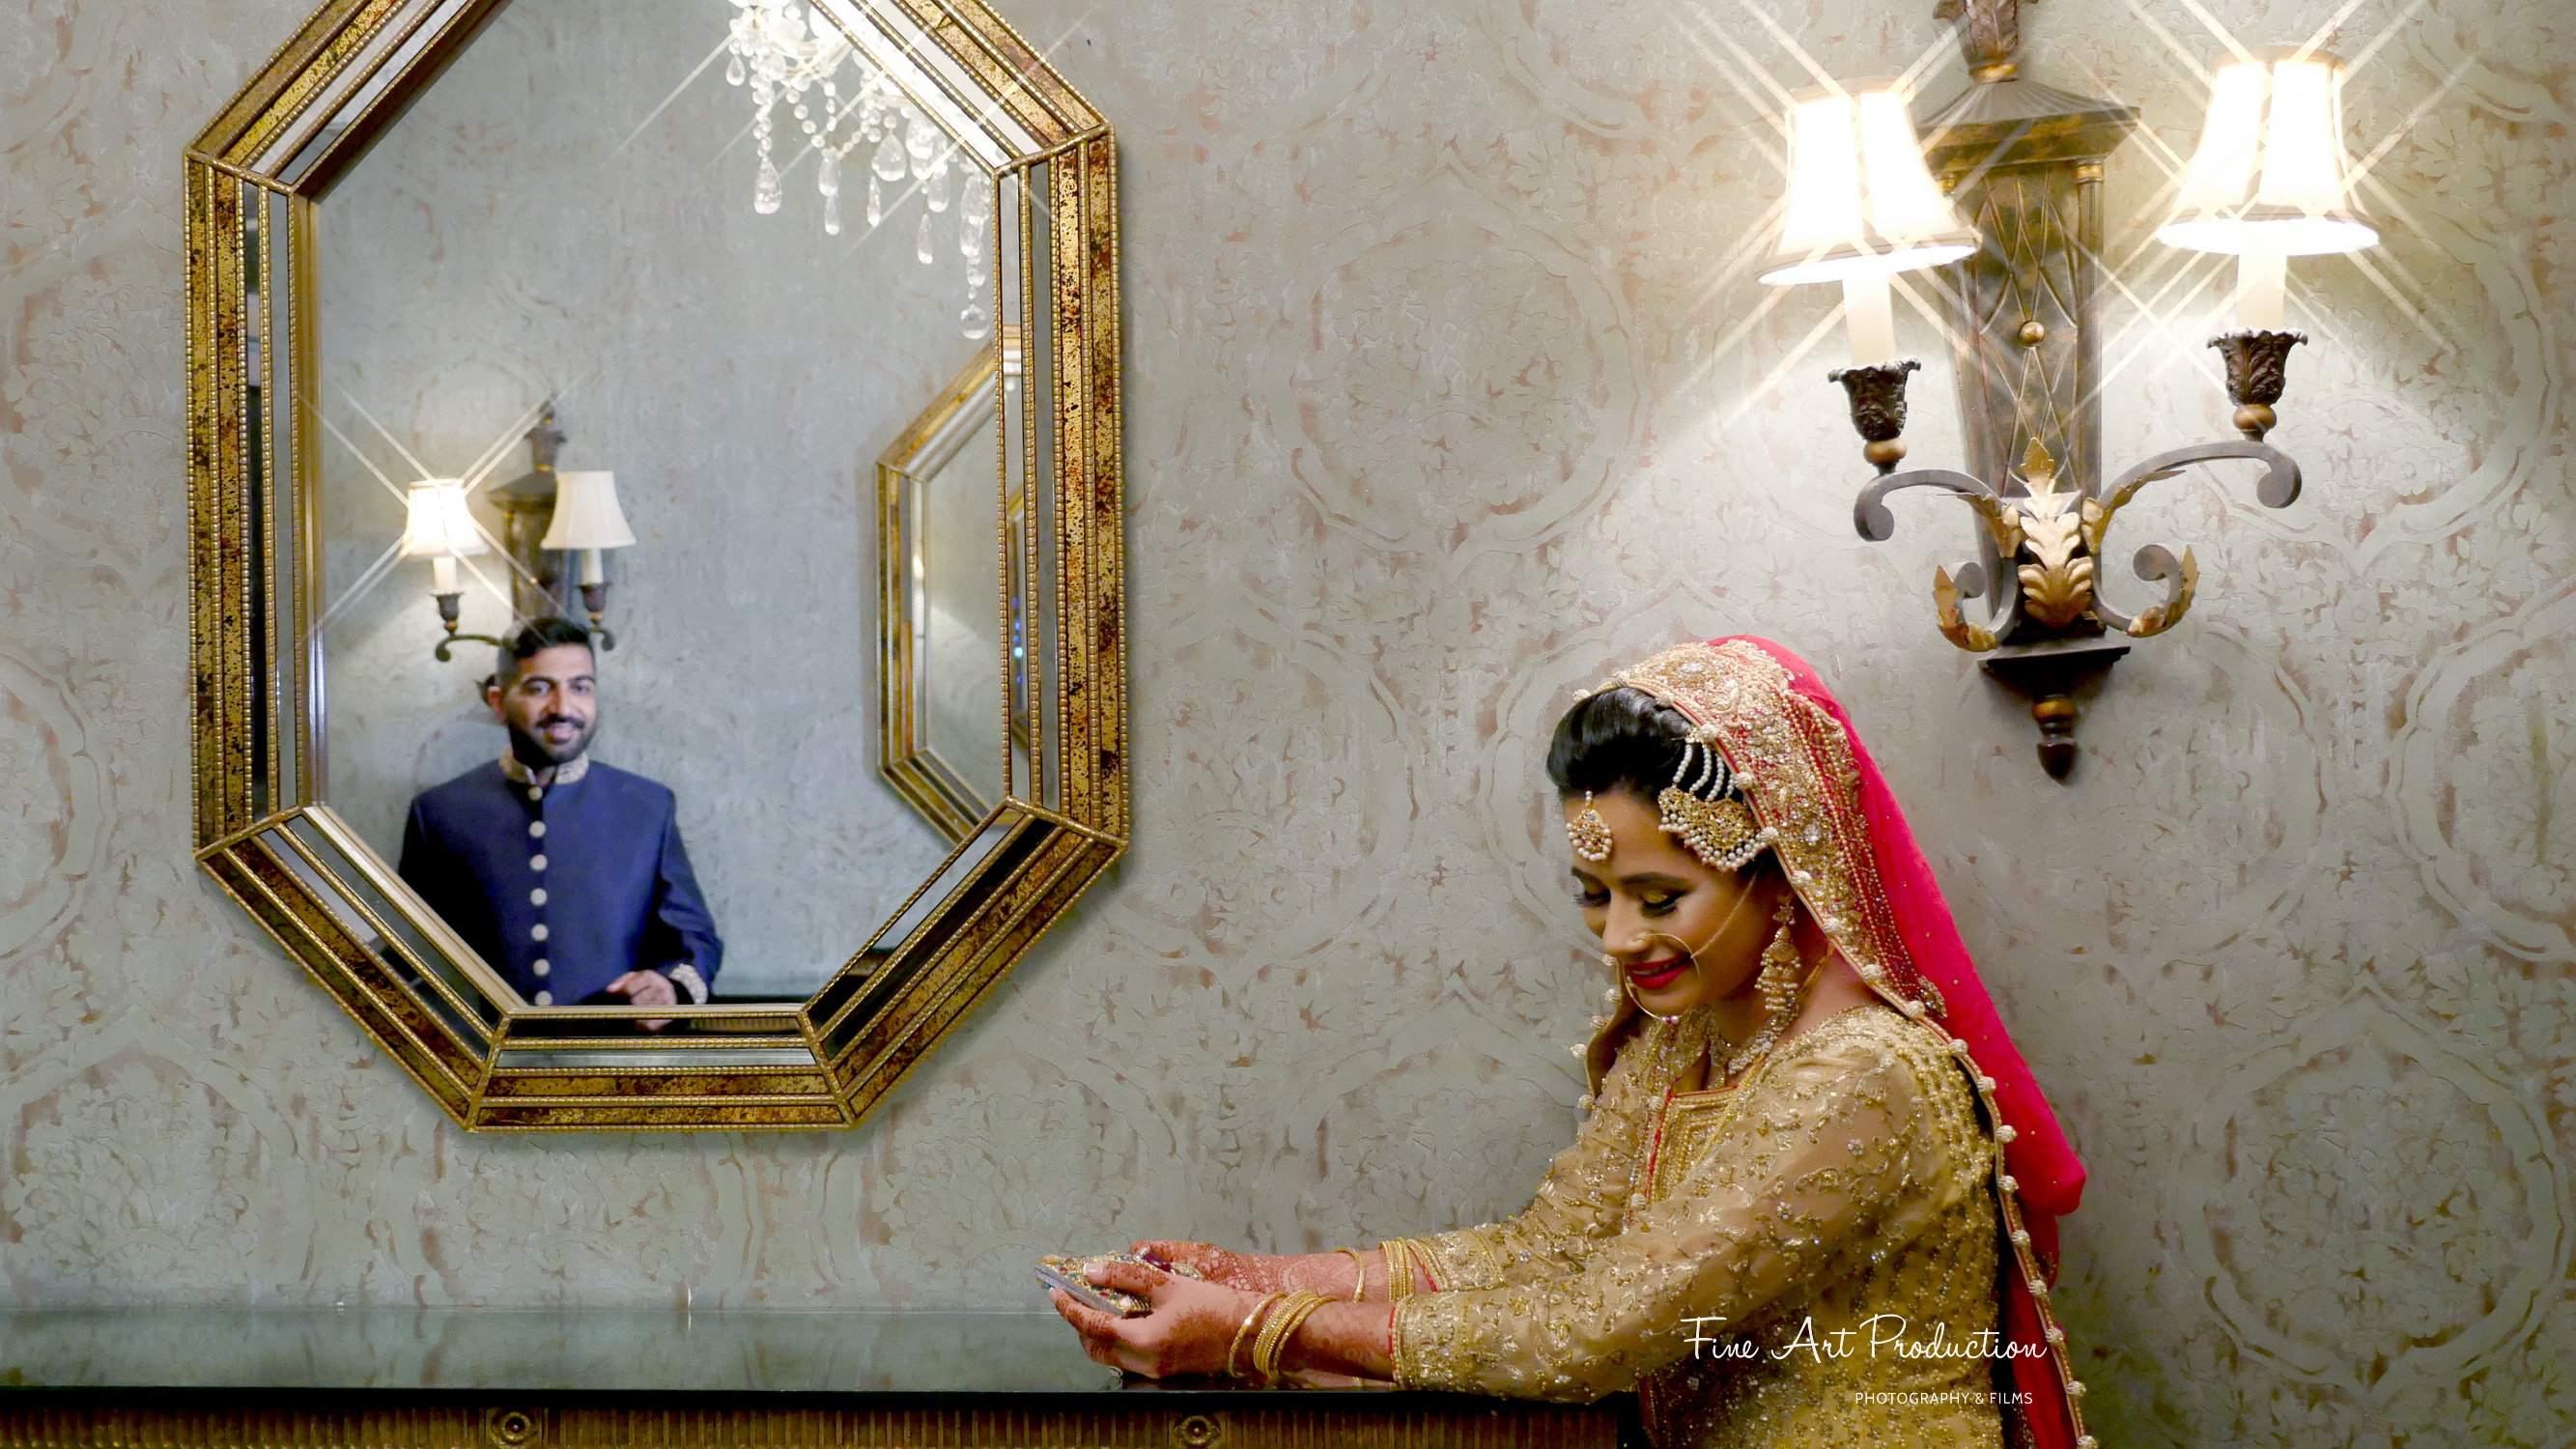 india-wedding-photographer-fine-art-production-chirali-amish-thakkar_0076